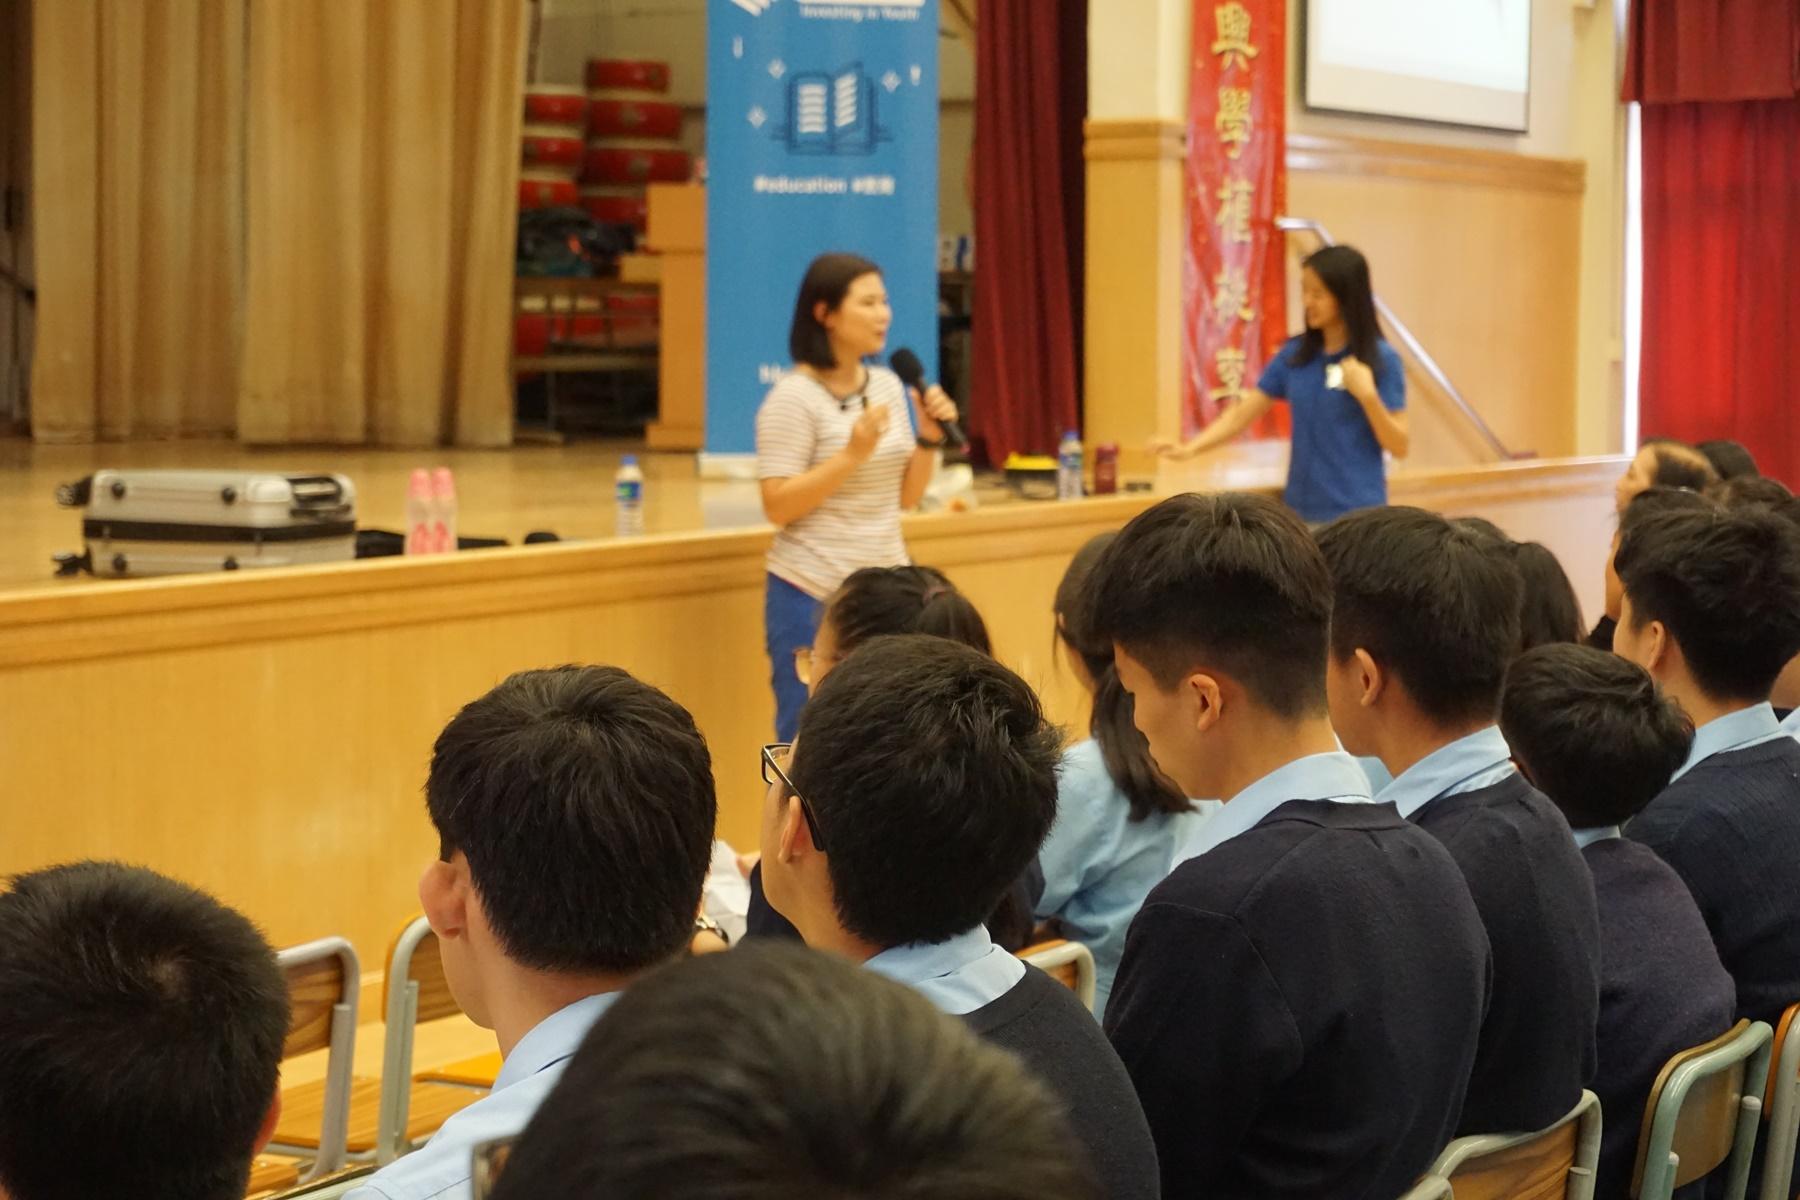 http://npc.edu.hk/sites/default/files/dsc04058.jpg